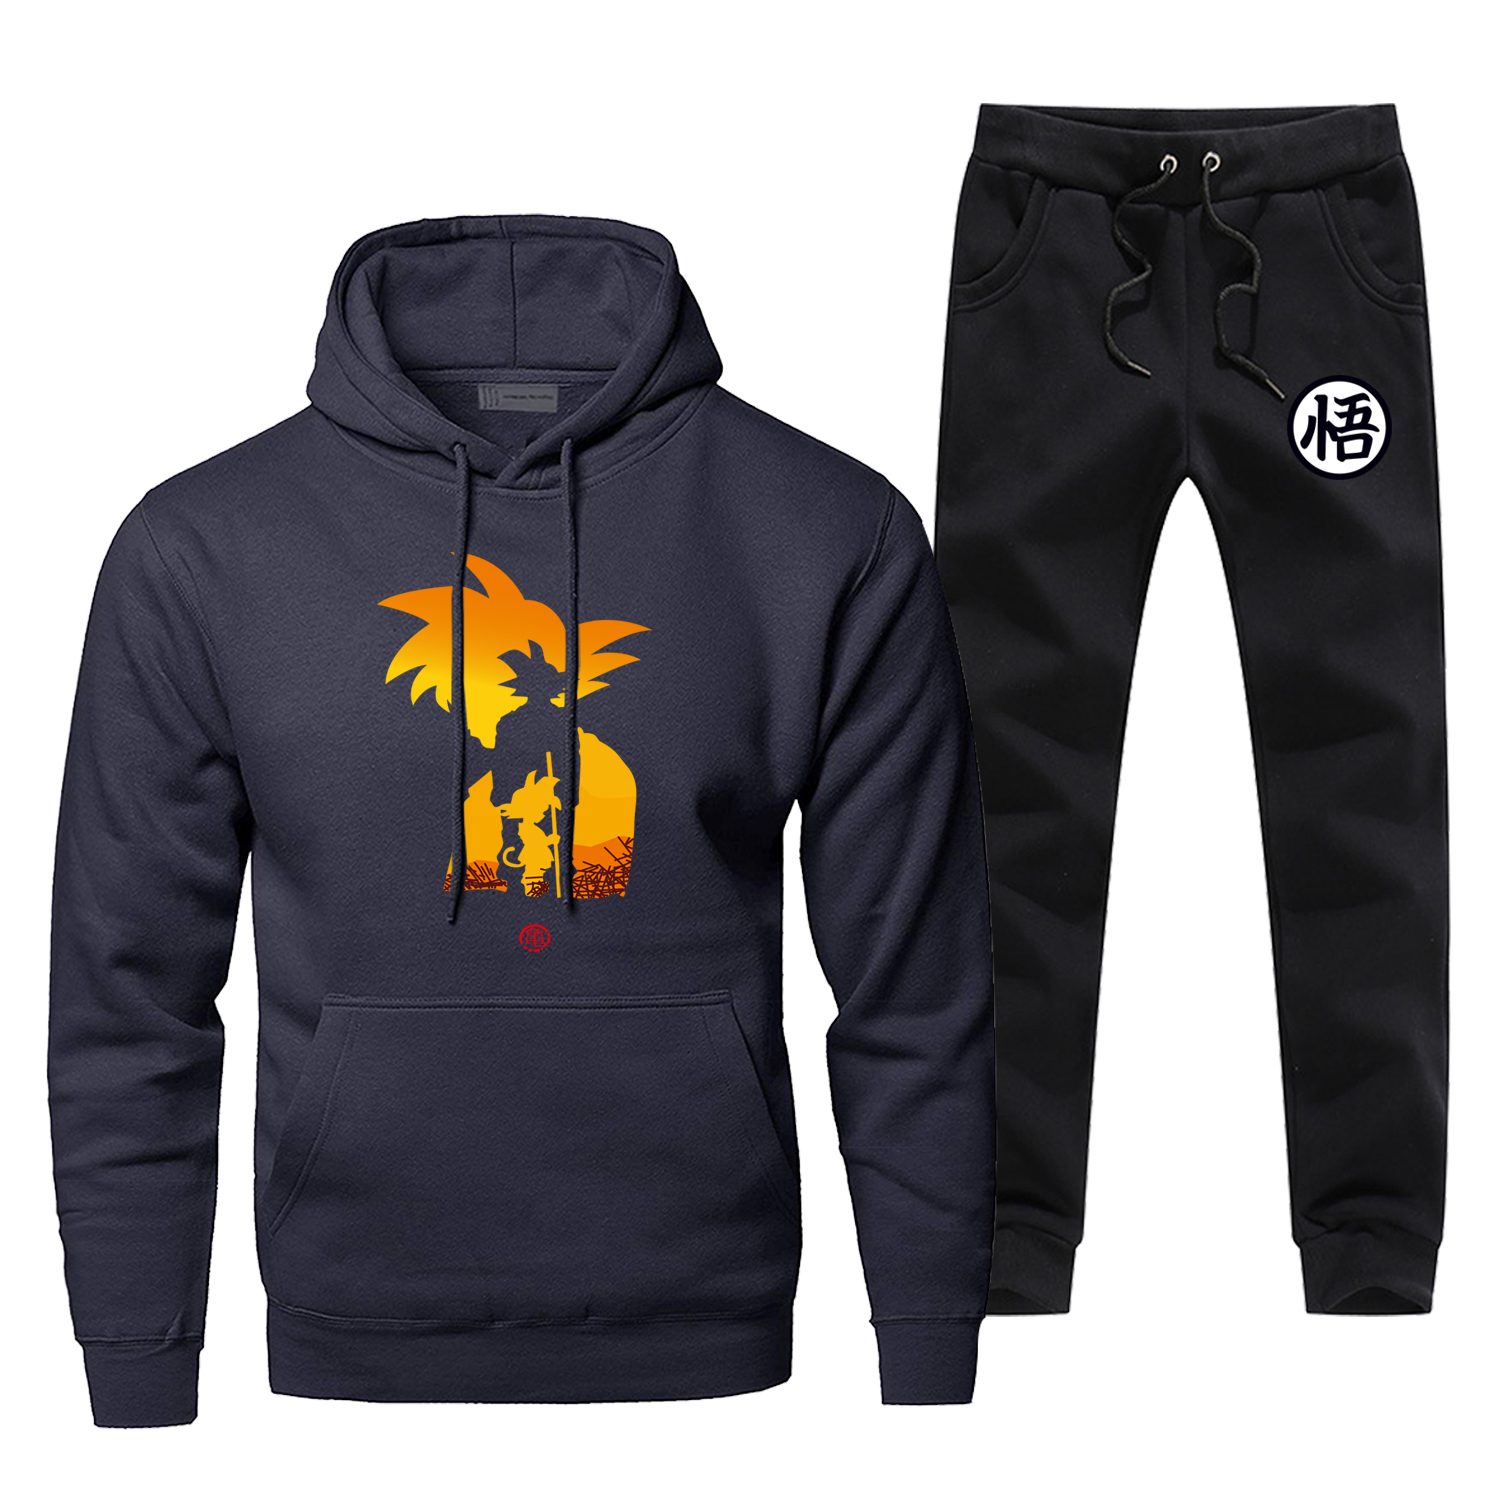 Japanese Anime Dragon Ball Hoodie Men Casual Sweatshirt Pants Sets Dragonball Z Harajuku Streetwear Fashion Fleece Sportswear